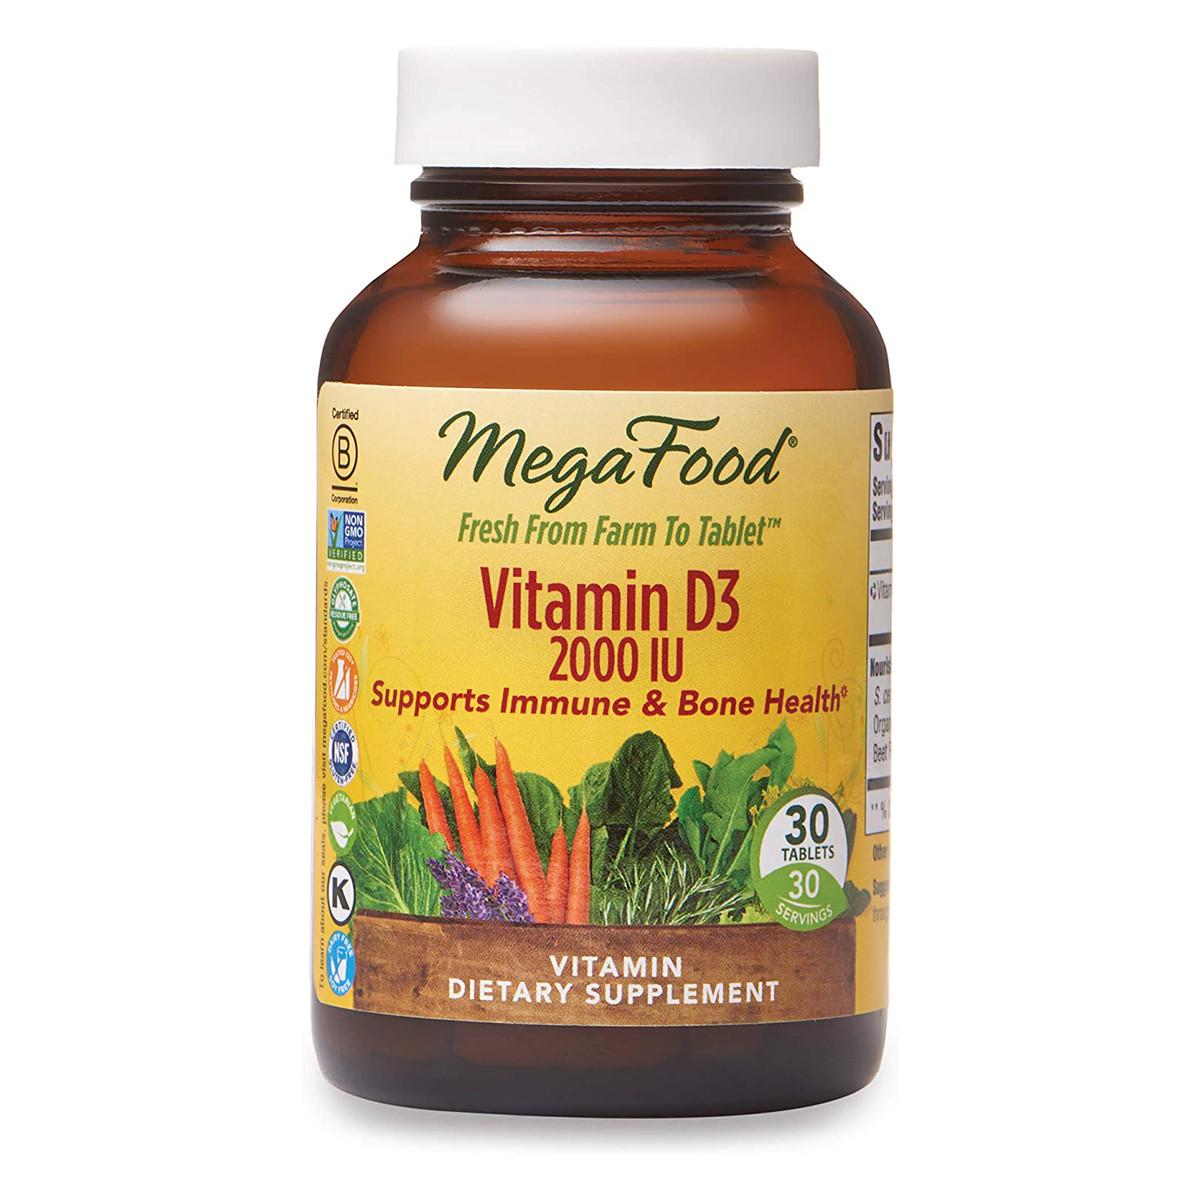 Витамин D3 2000 IU, Vitamin D3, MegaFood, 30 таблеток